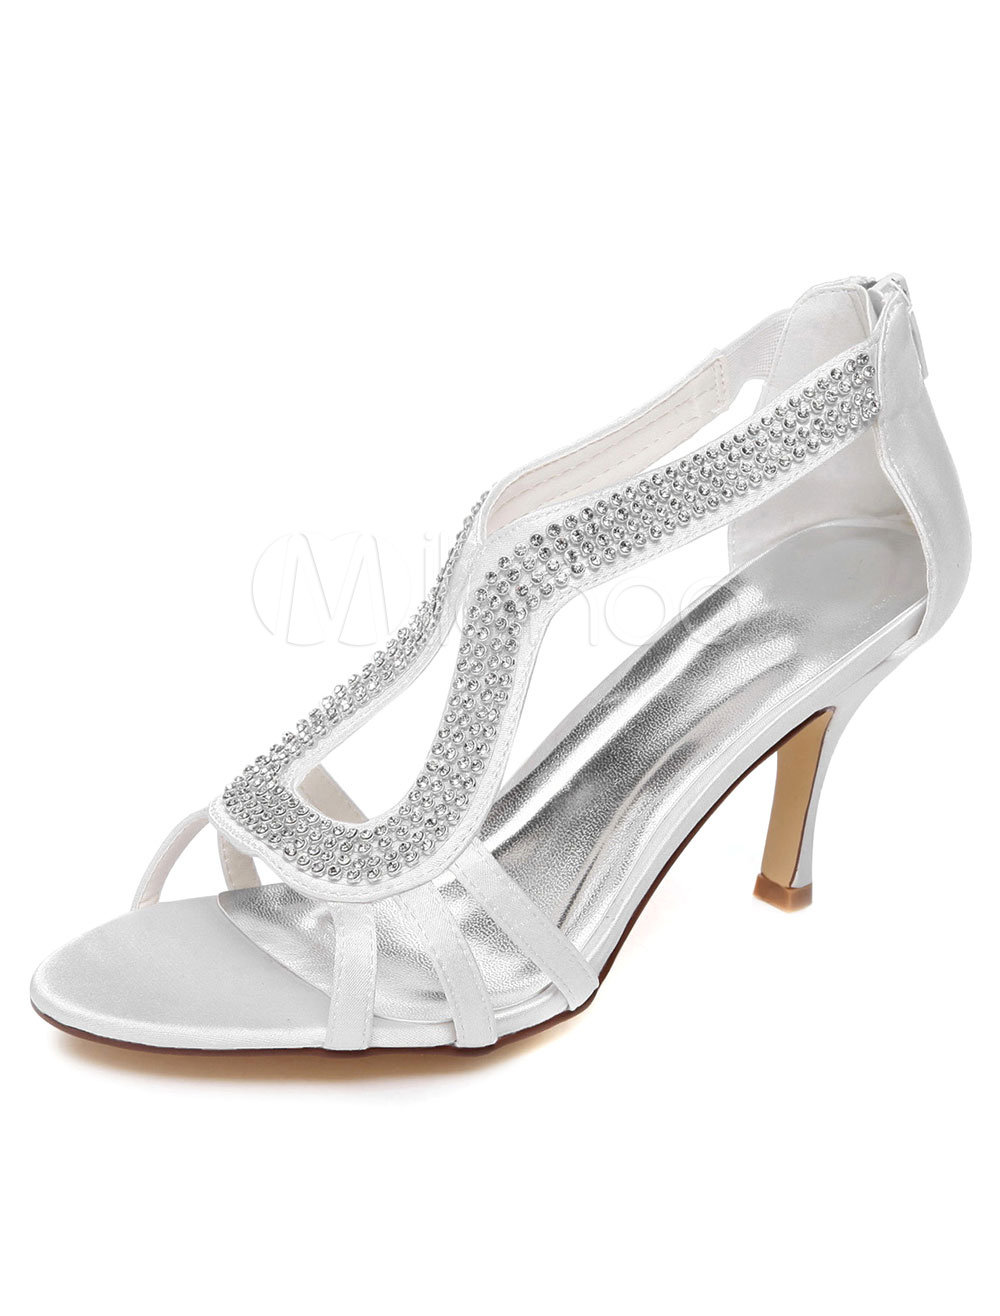 White Rhinestones Satin Open Toe Evening&Bridal Sandals